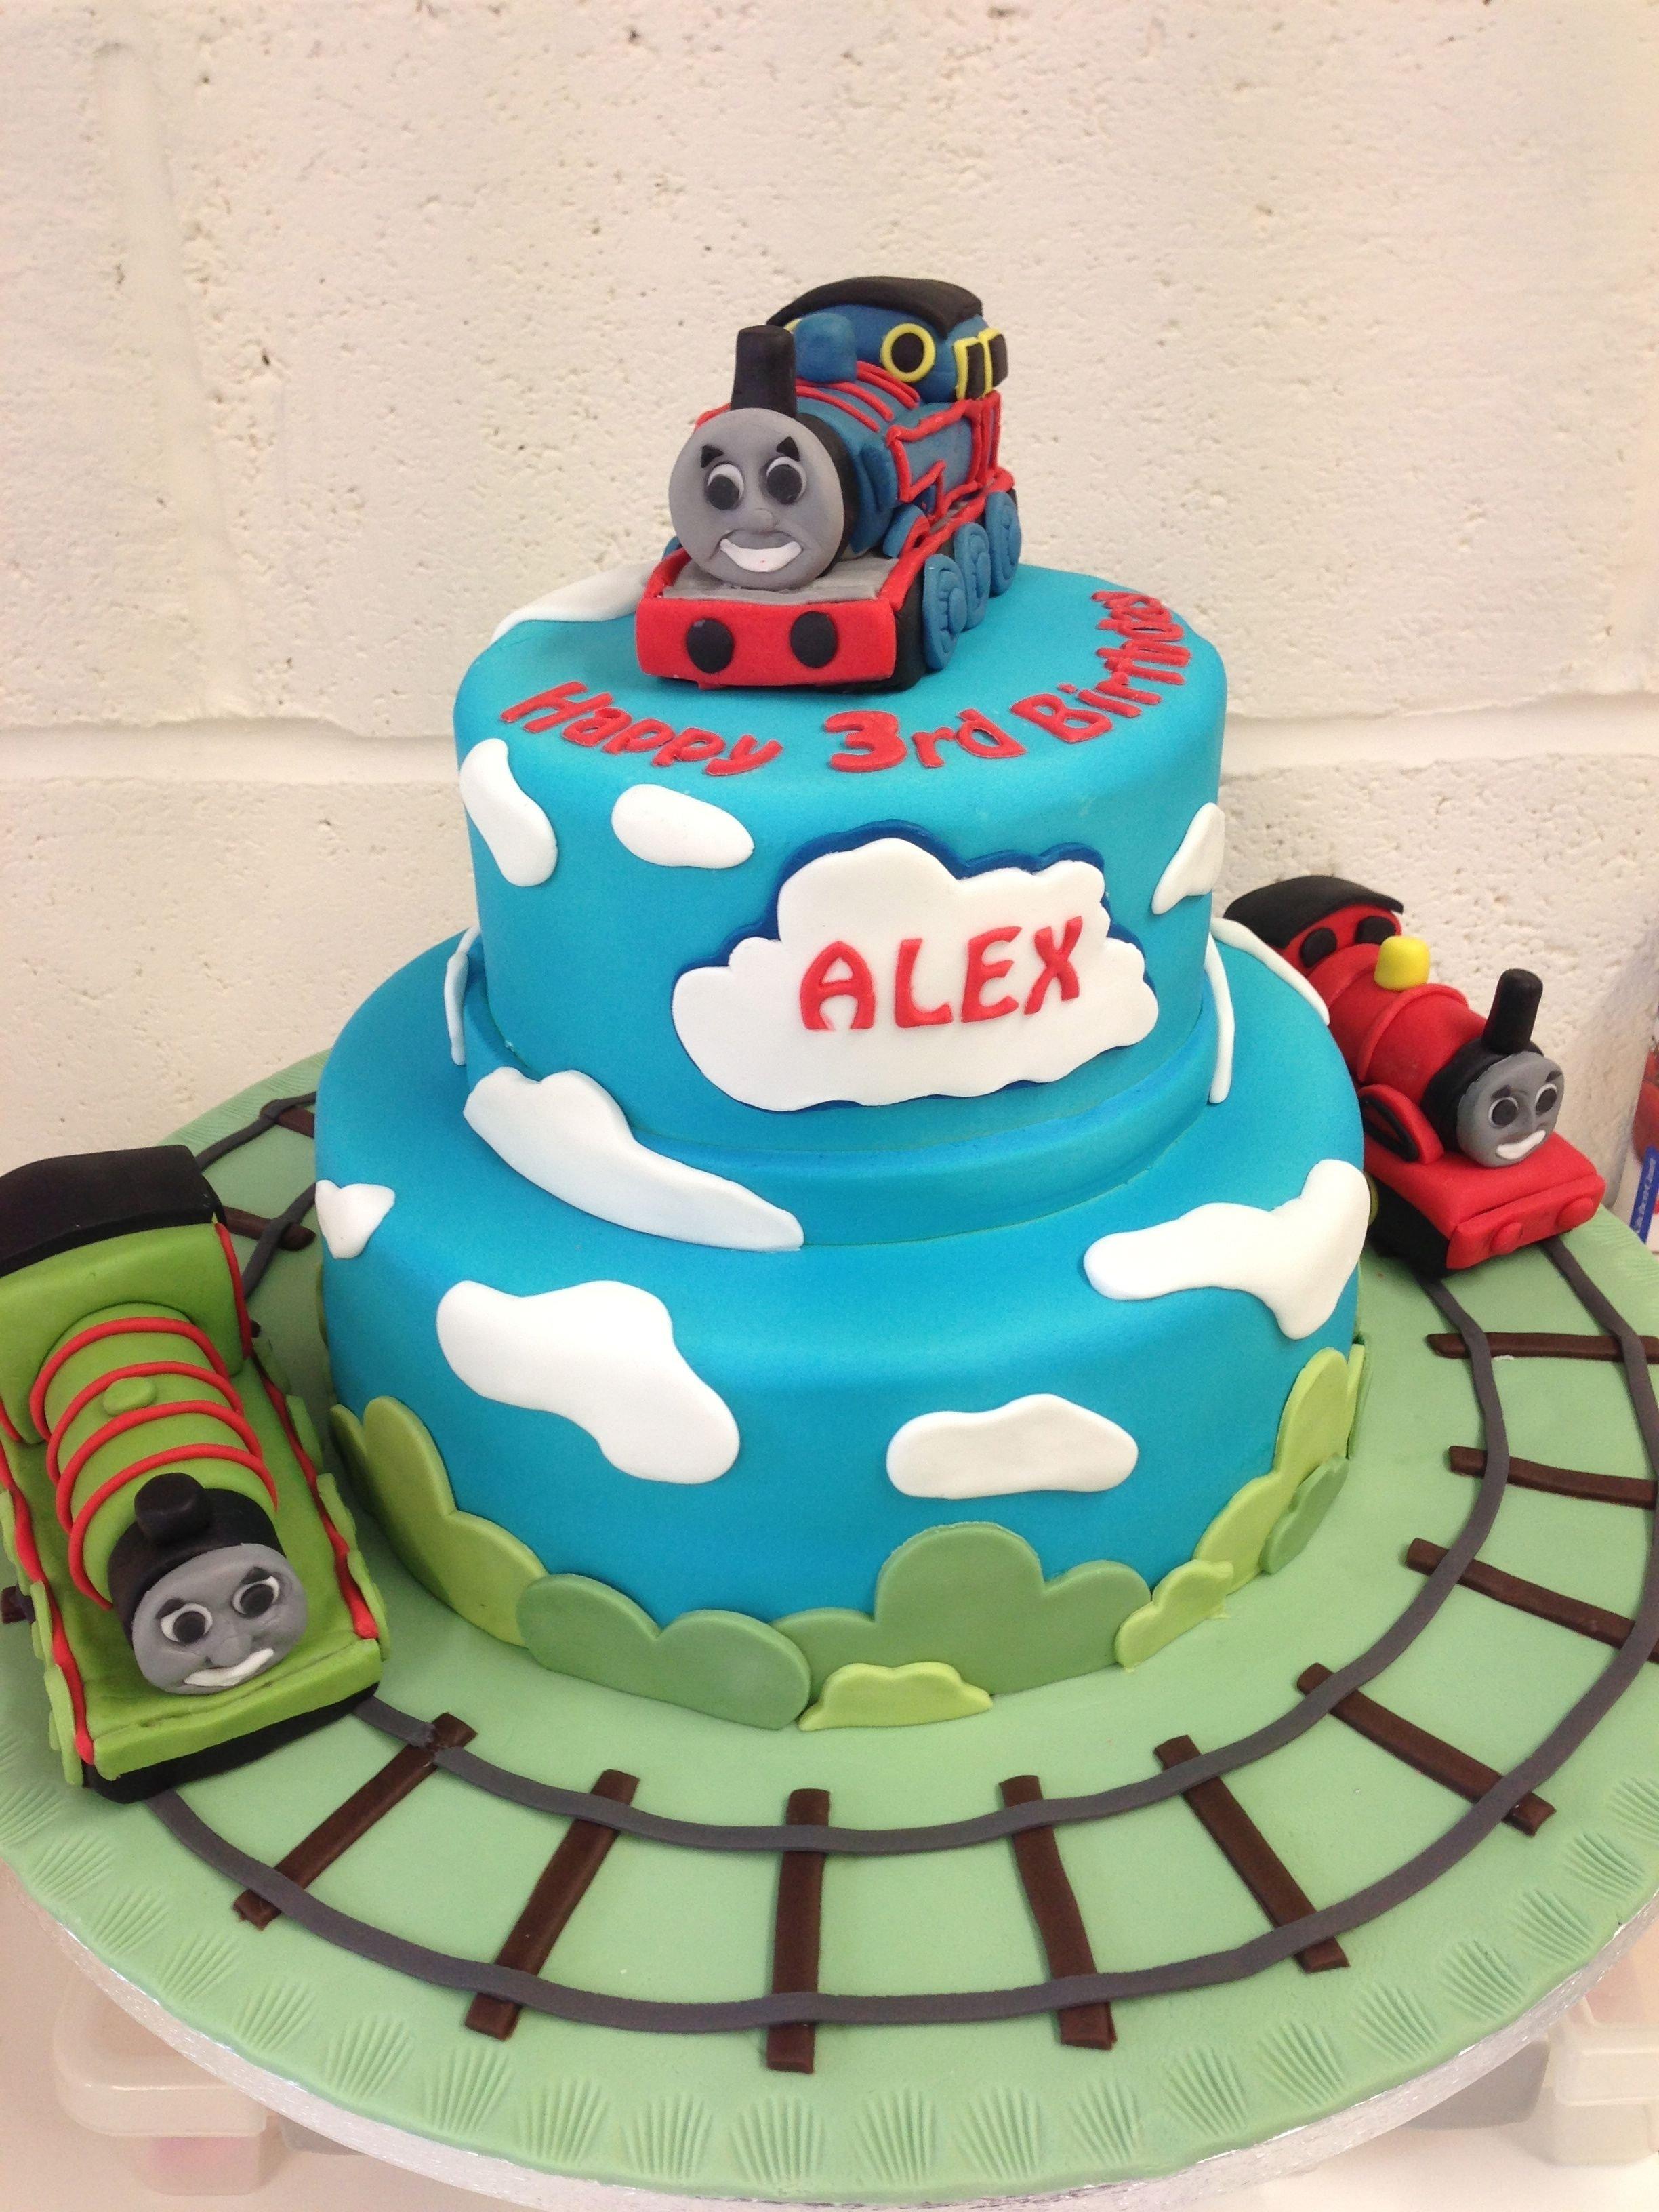 10 Nice Thomas And Friends Cake Ideas thomas and friends cake google search diegos 2nd bday thomas 2020